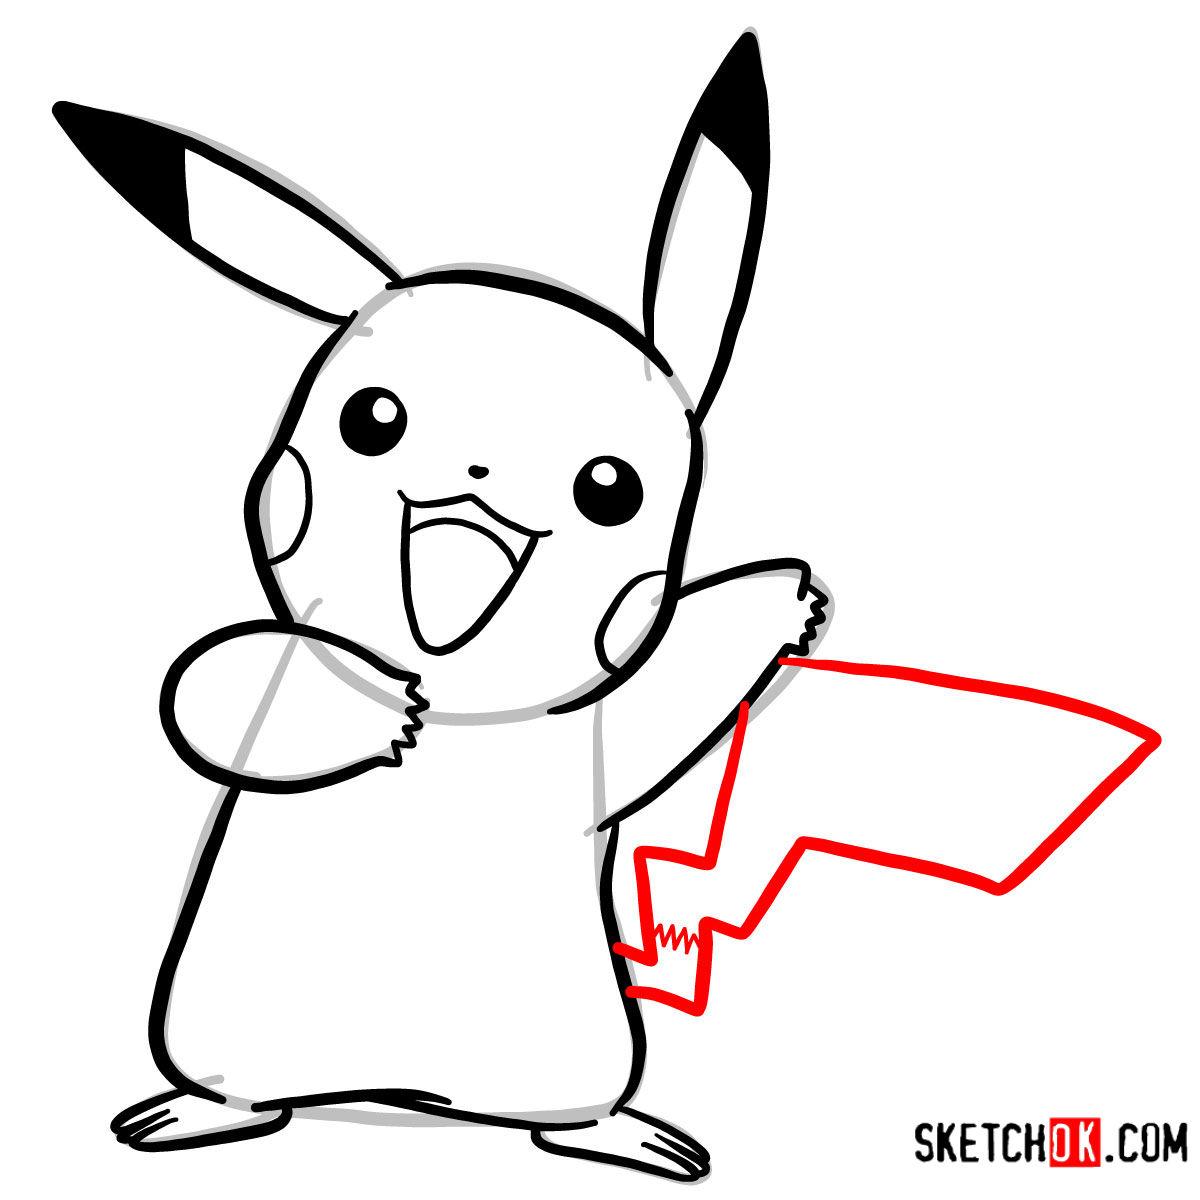 How to draw Happy Pikachu | Pokemon - Step by step drawing ...